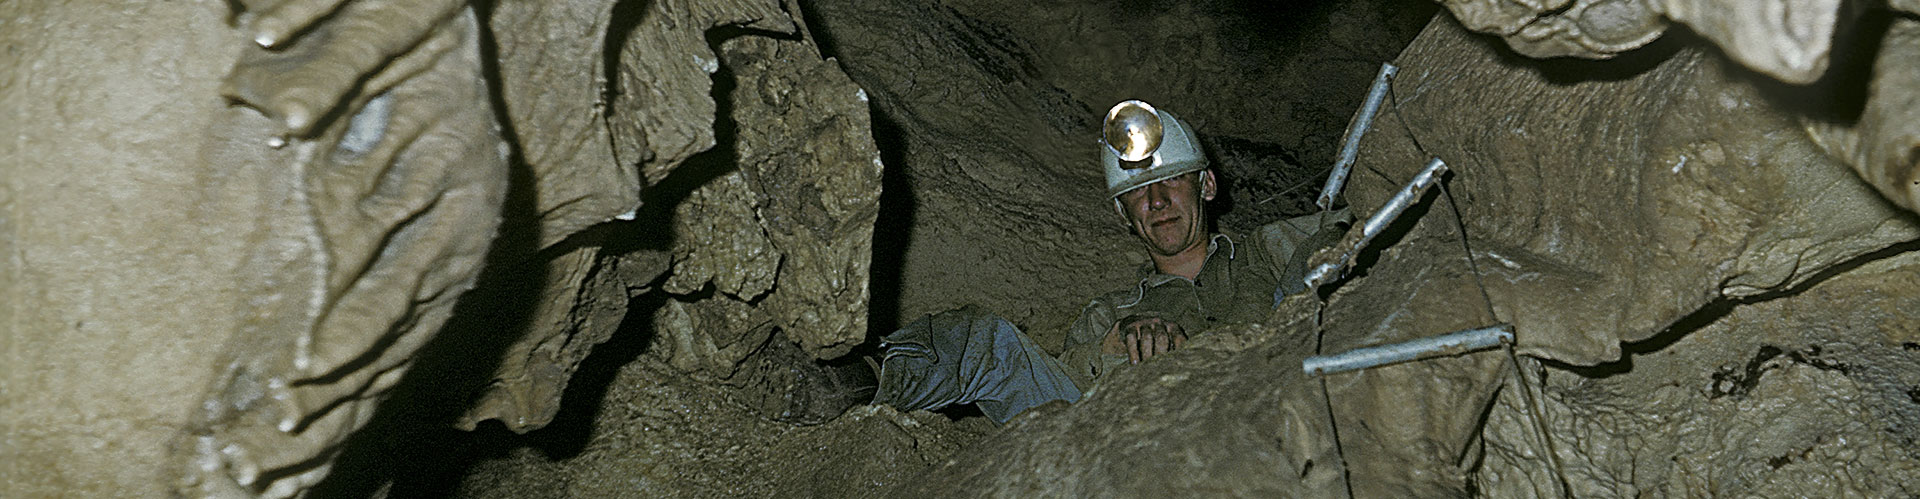 Historical Spelunker in Cave